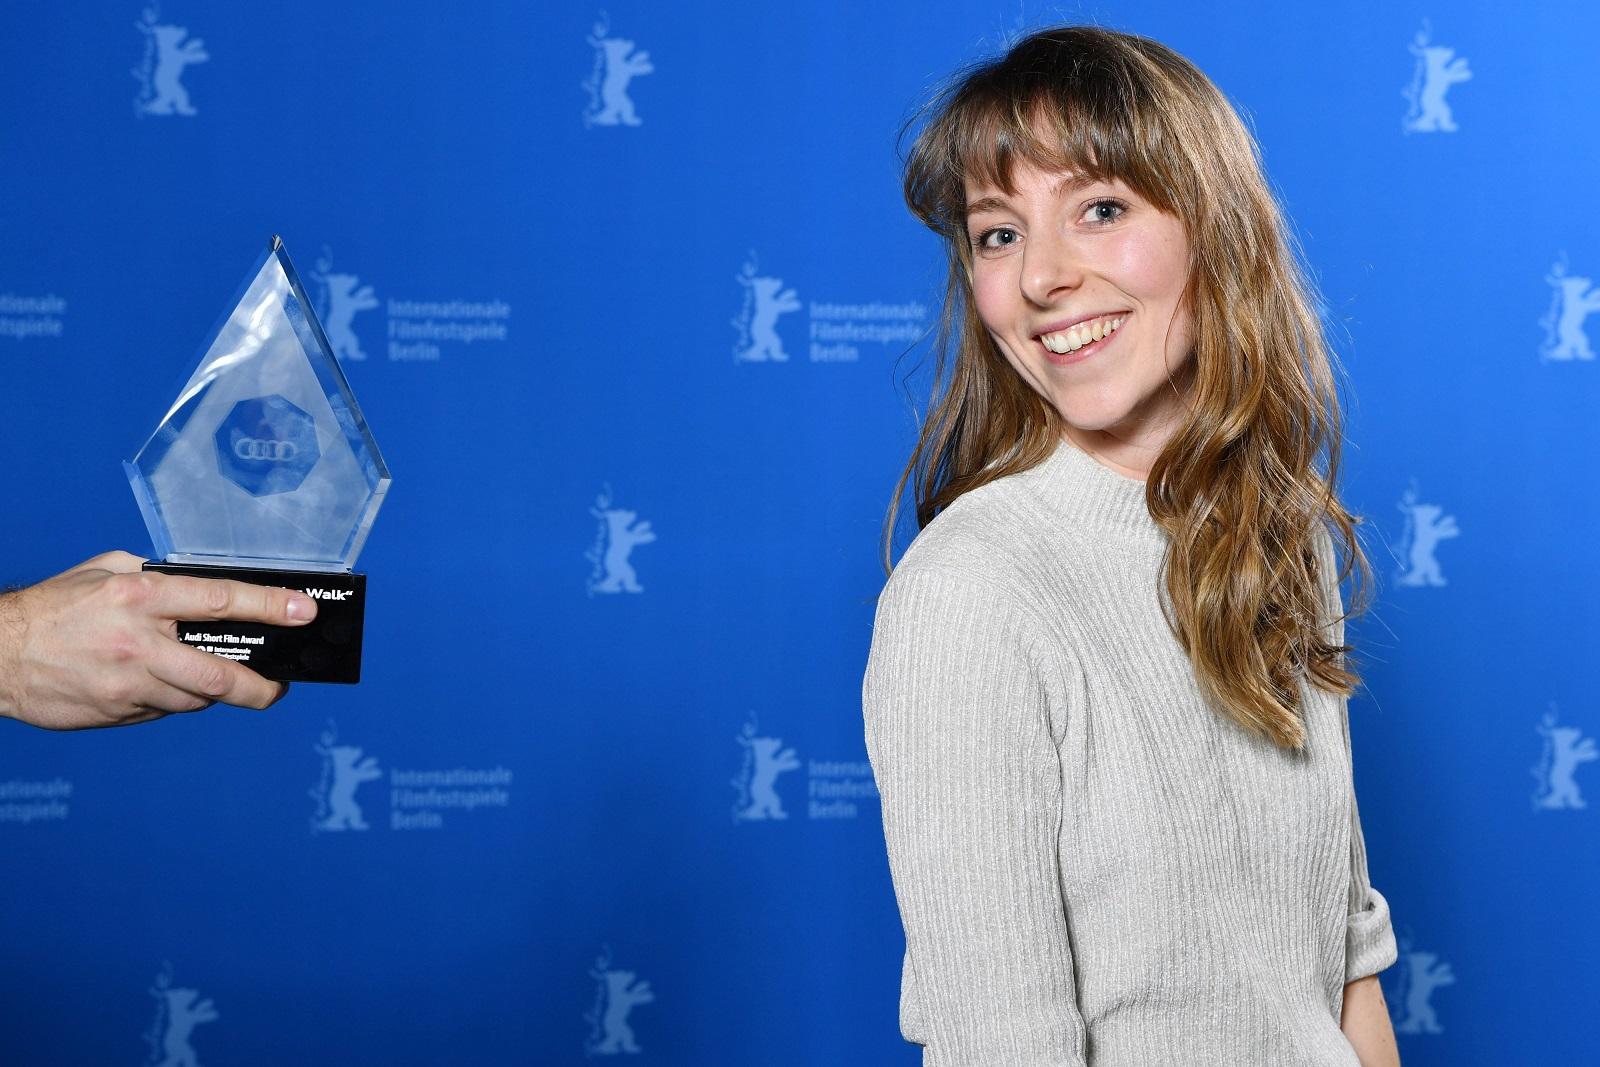 bucsi_reka_x_berlinale_audi_short_film_award.jpg